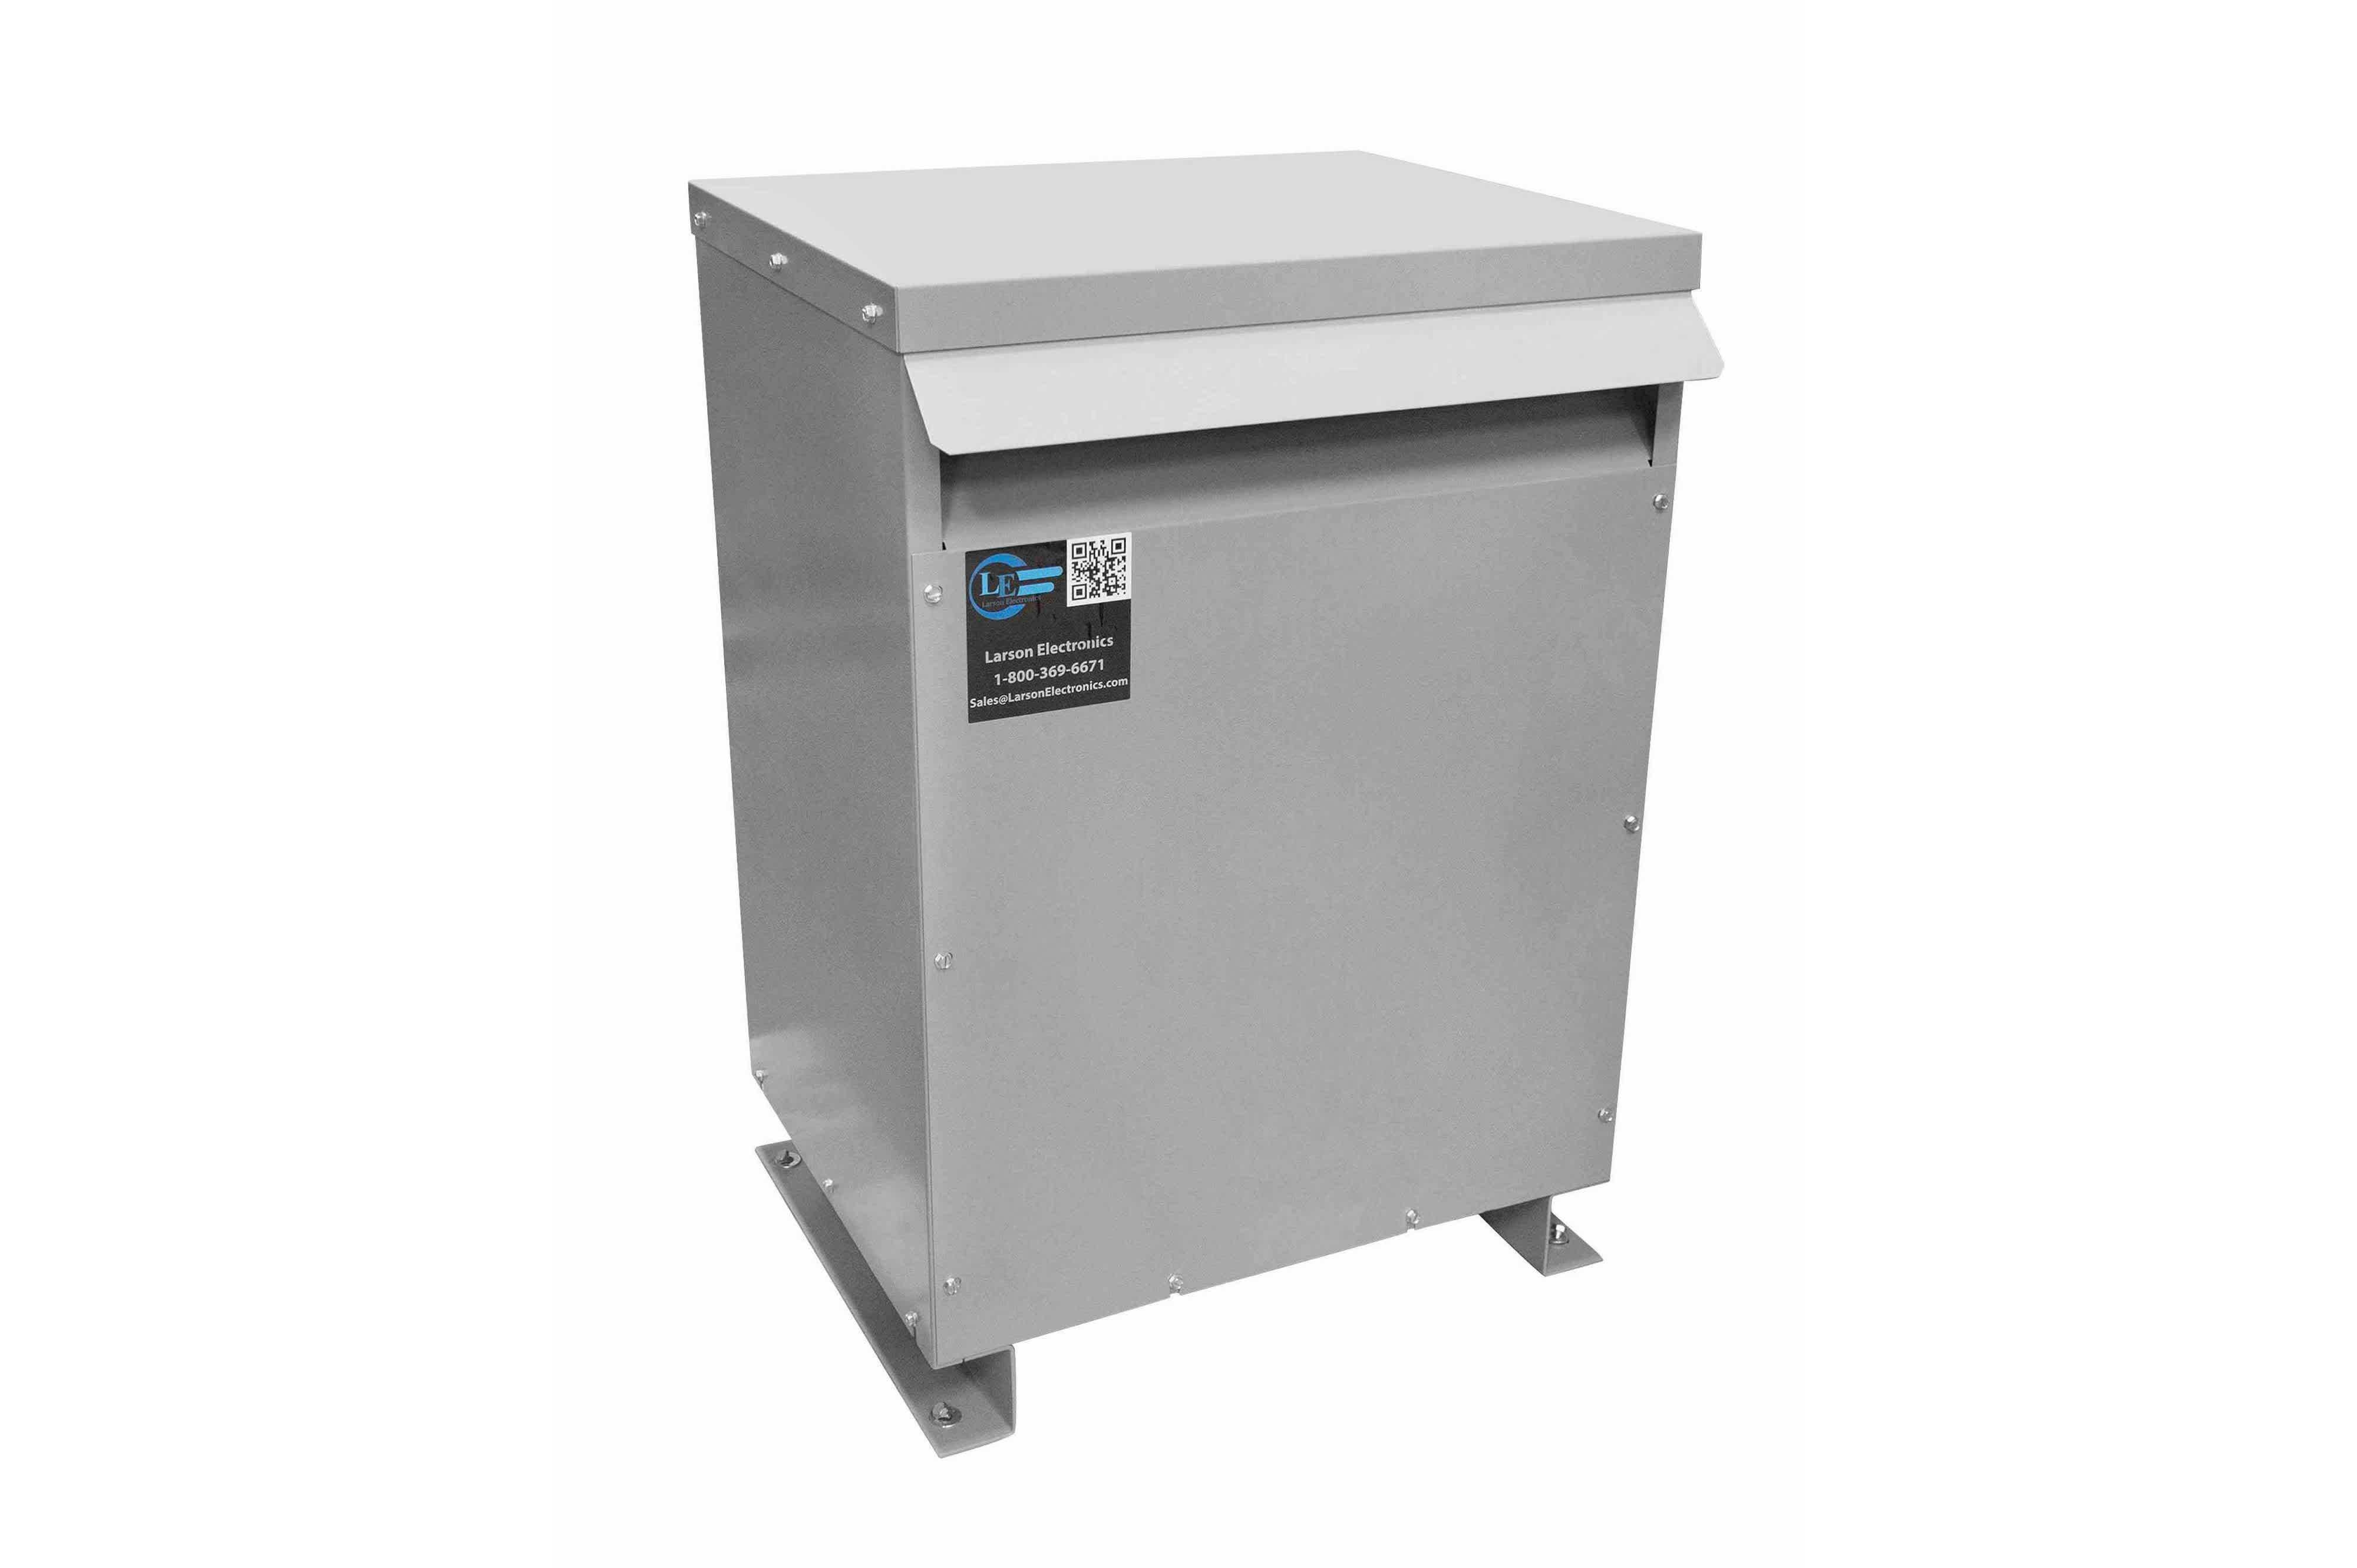 137.5 kVA 3PH Isolation Transformer, 460V Wye Primary, 415Y/240 Wye-N Secondary, N3R, Ventilated, 60 Hz